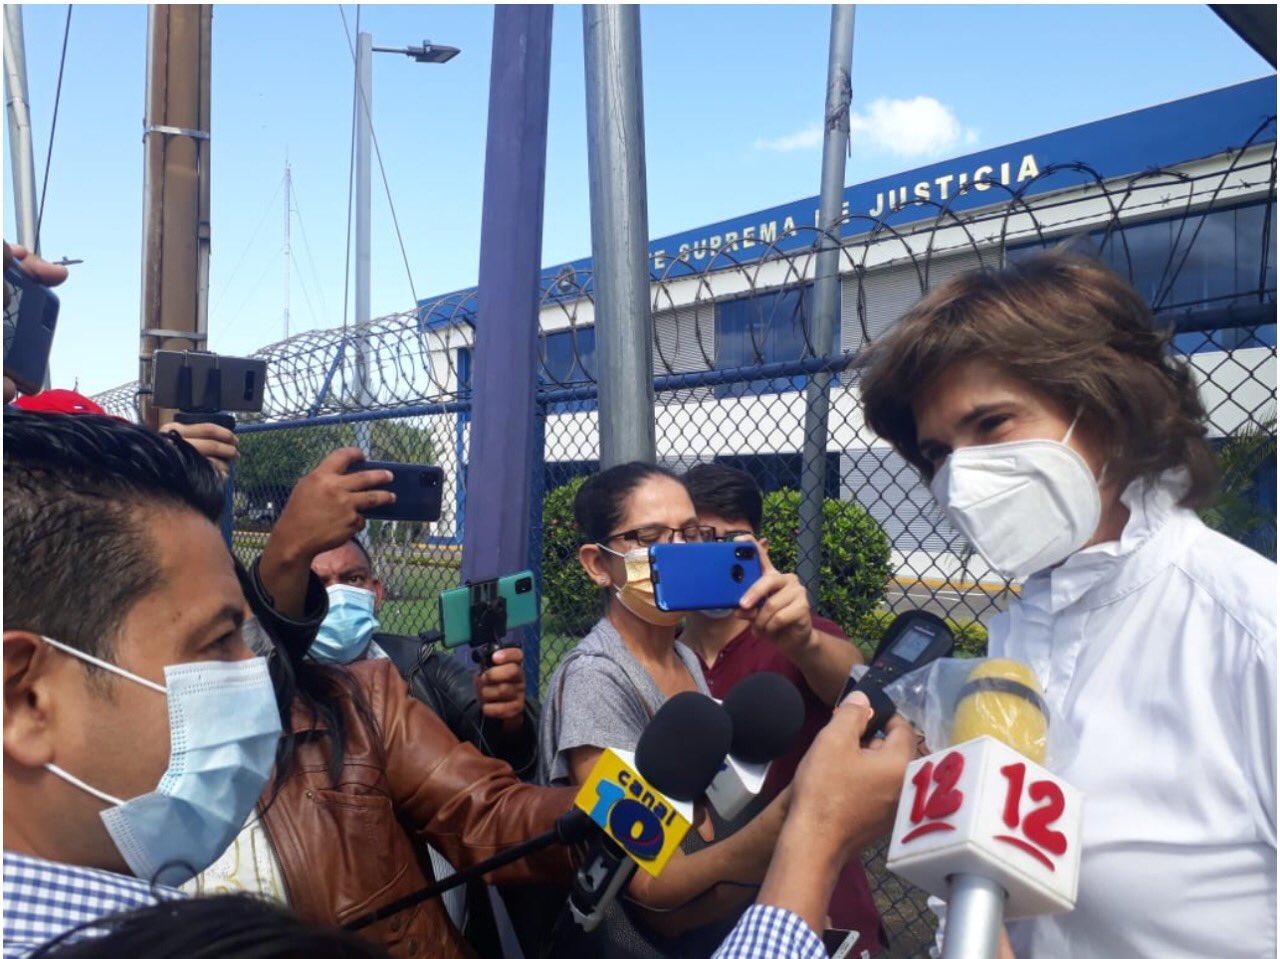 Cristiana Chamorro es la hija de la expresidenta Violeta Chamorro / Foto: WC